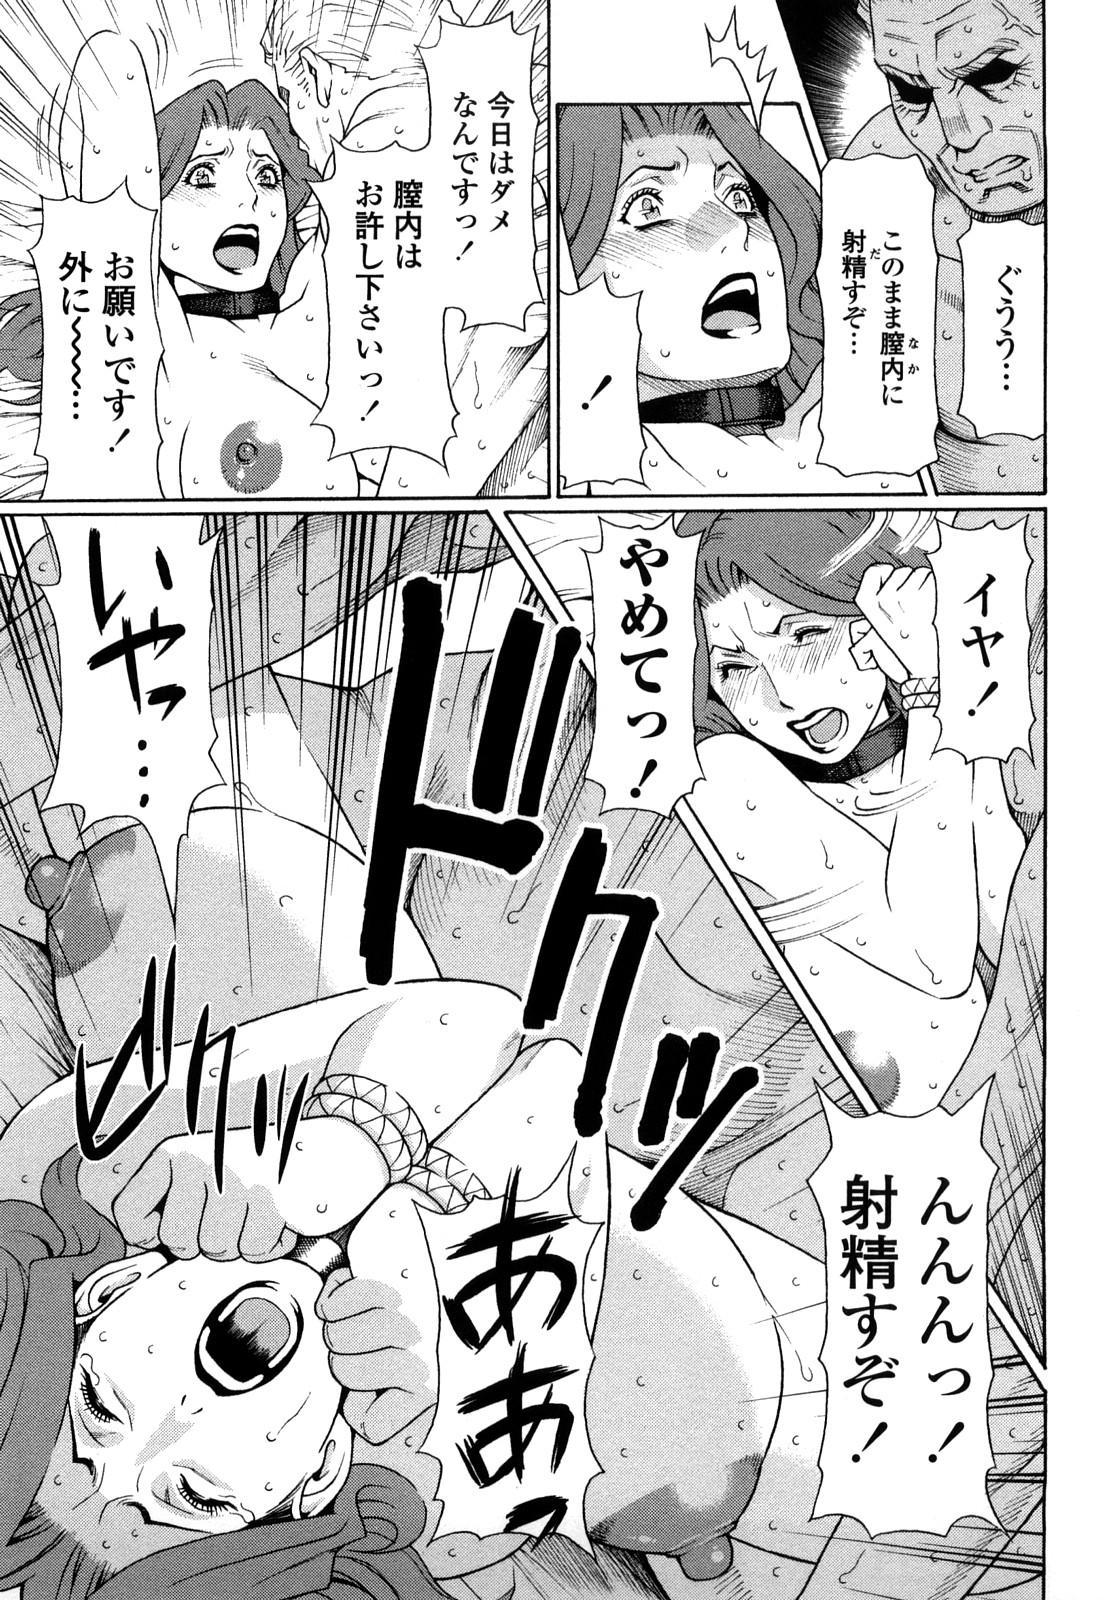 [Takasugi Kou] Kindan no Haha-Ana - Immorality Love-Hole [Decensored] 100